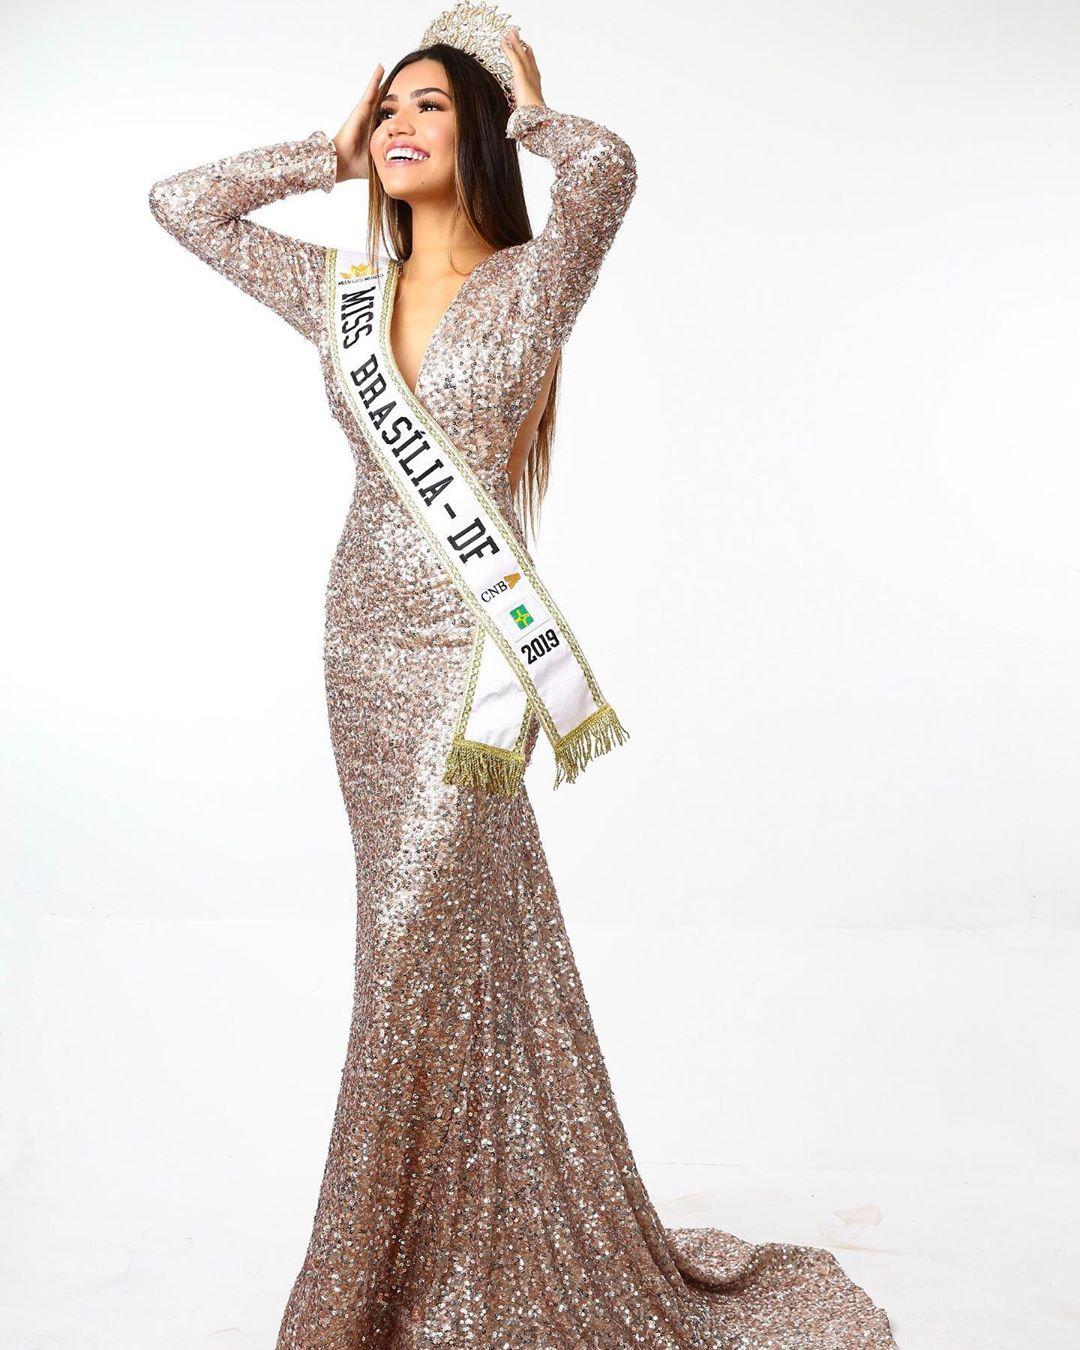 maiza santa rita, top 10 de miss brasil mundo 2019. 66442411